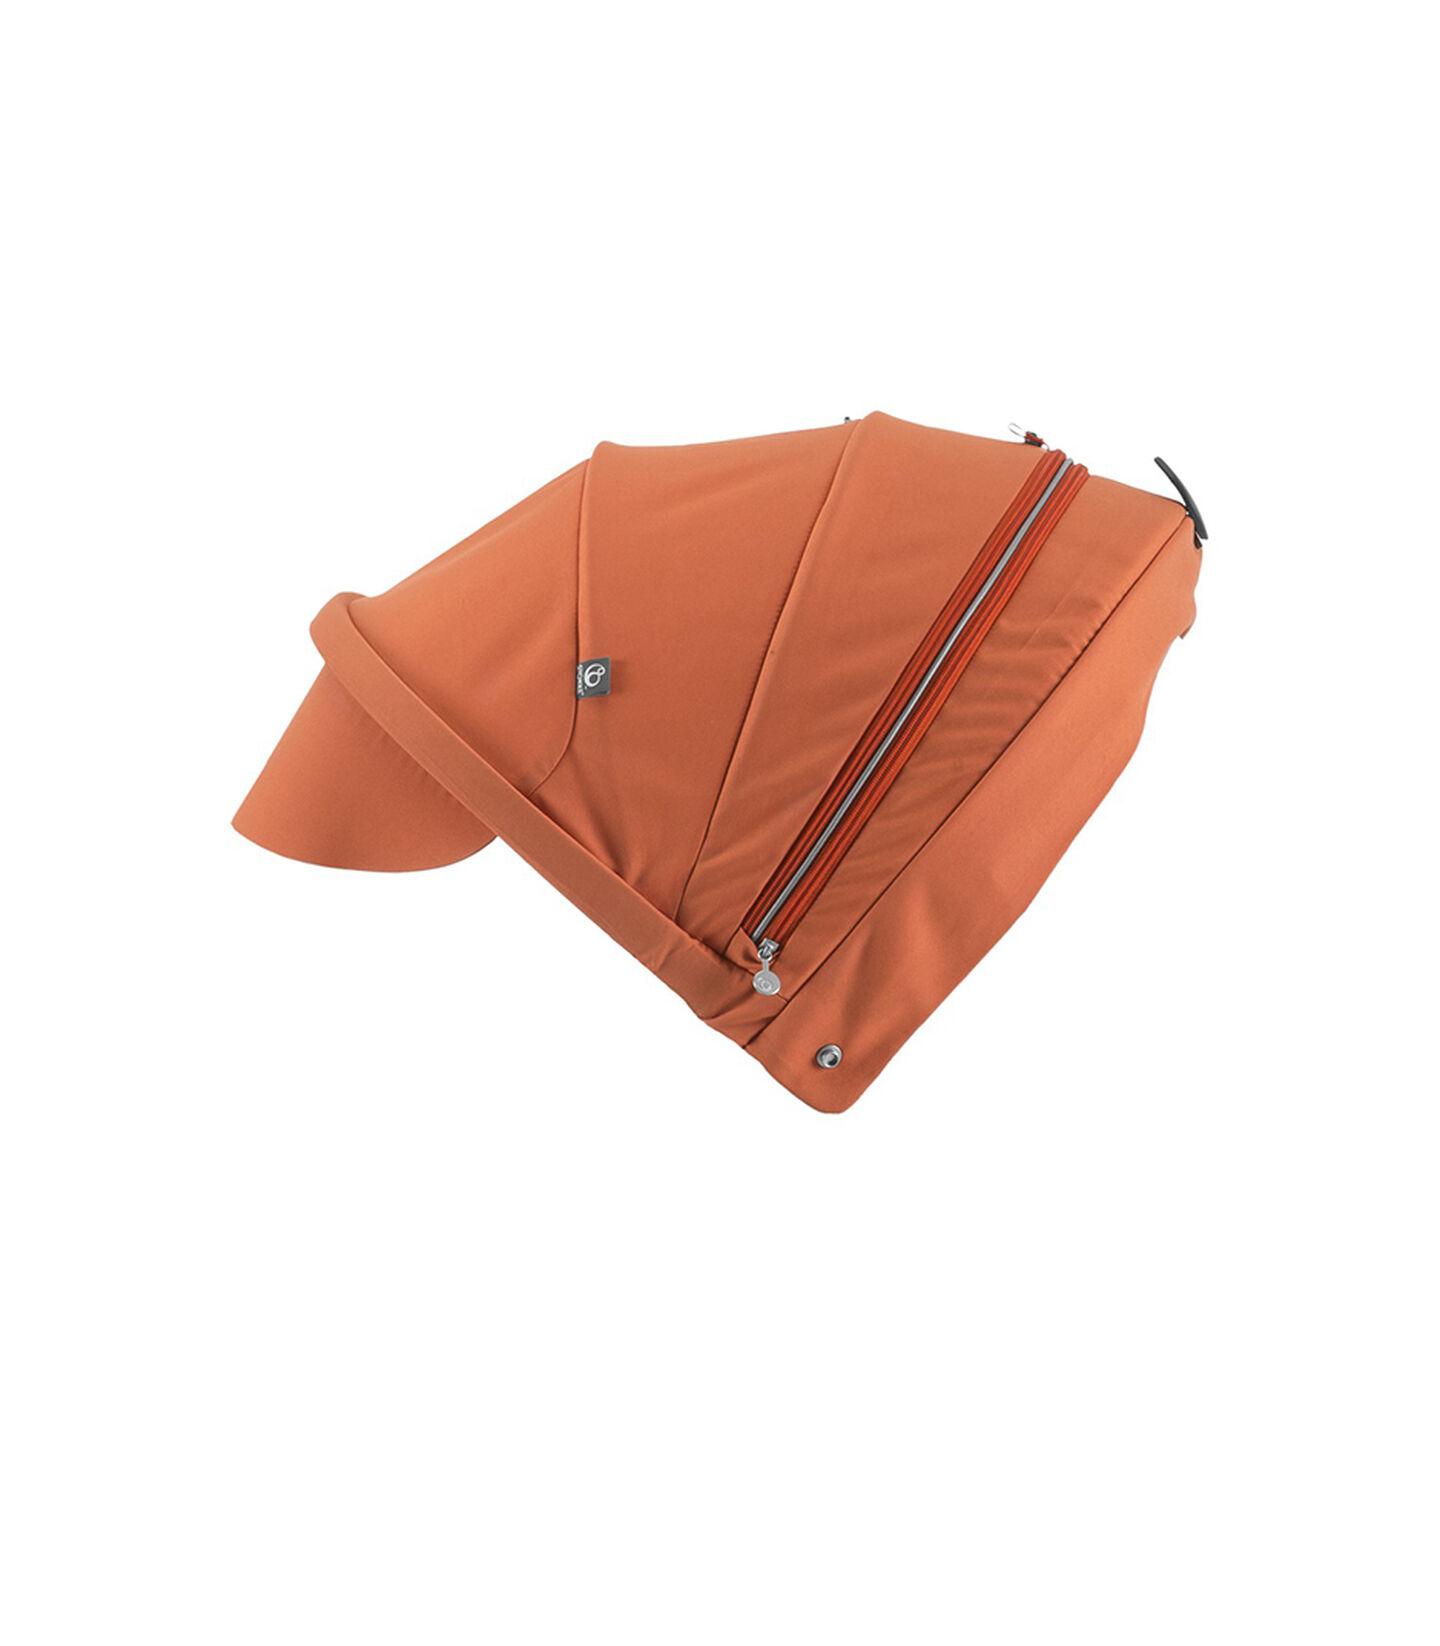 Stokke® Scoot™ Canopy, Orange.